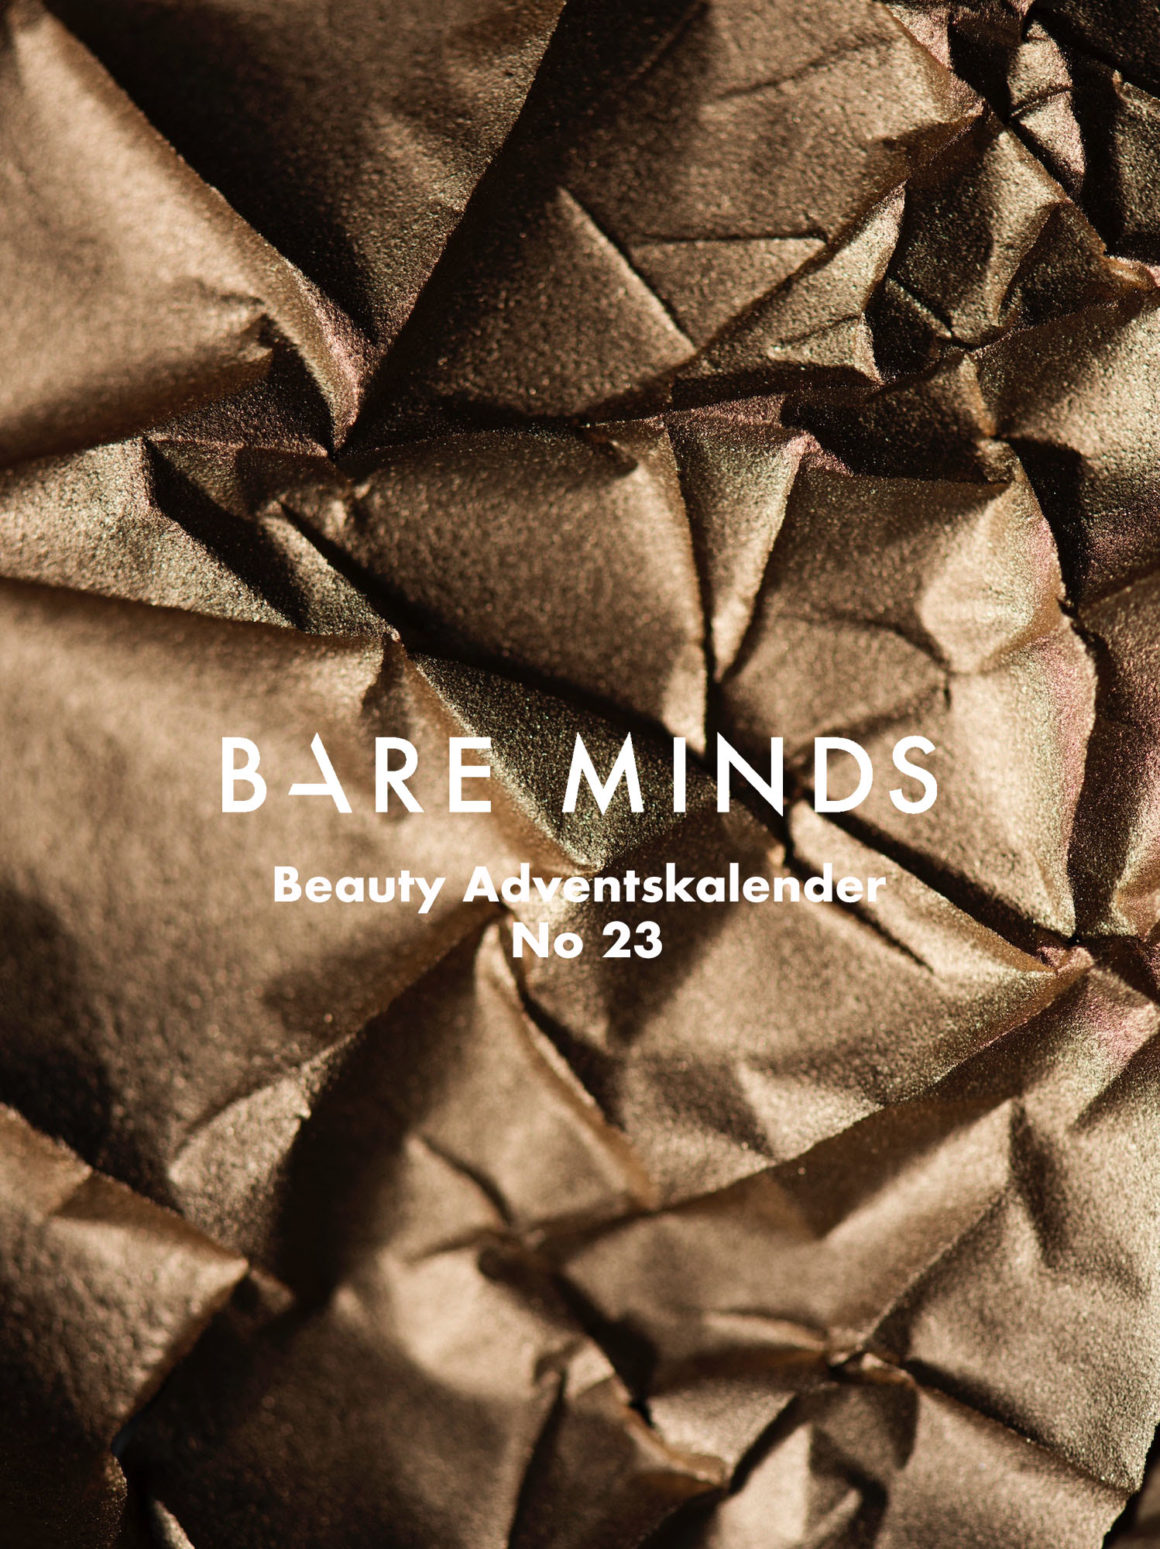 Bare Minds Beauty Adventskalender rawpixel-632459-unsplash